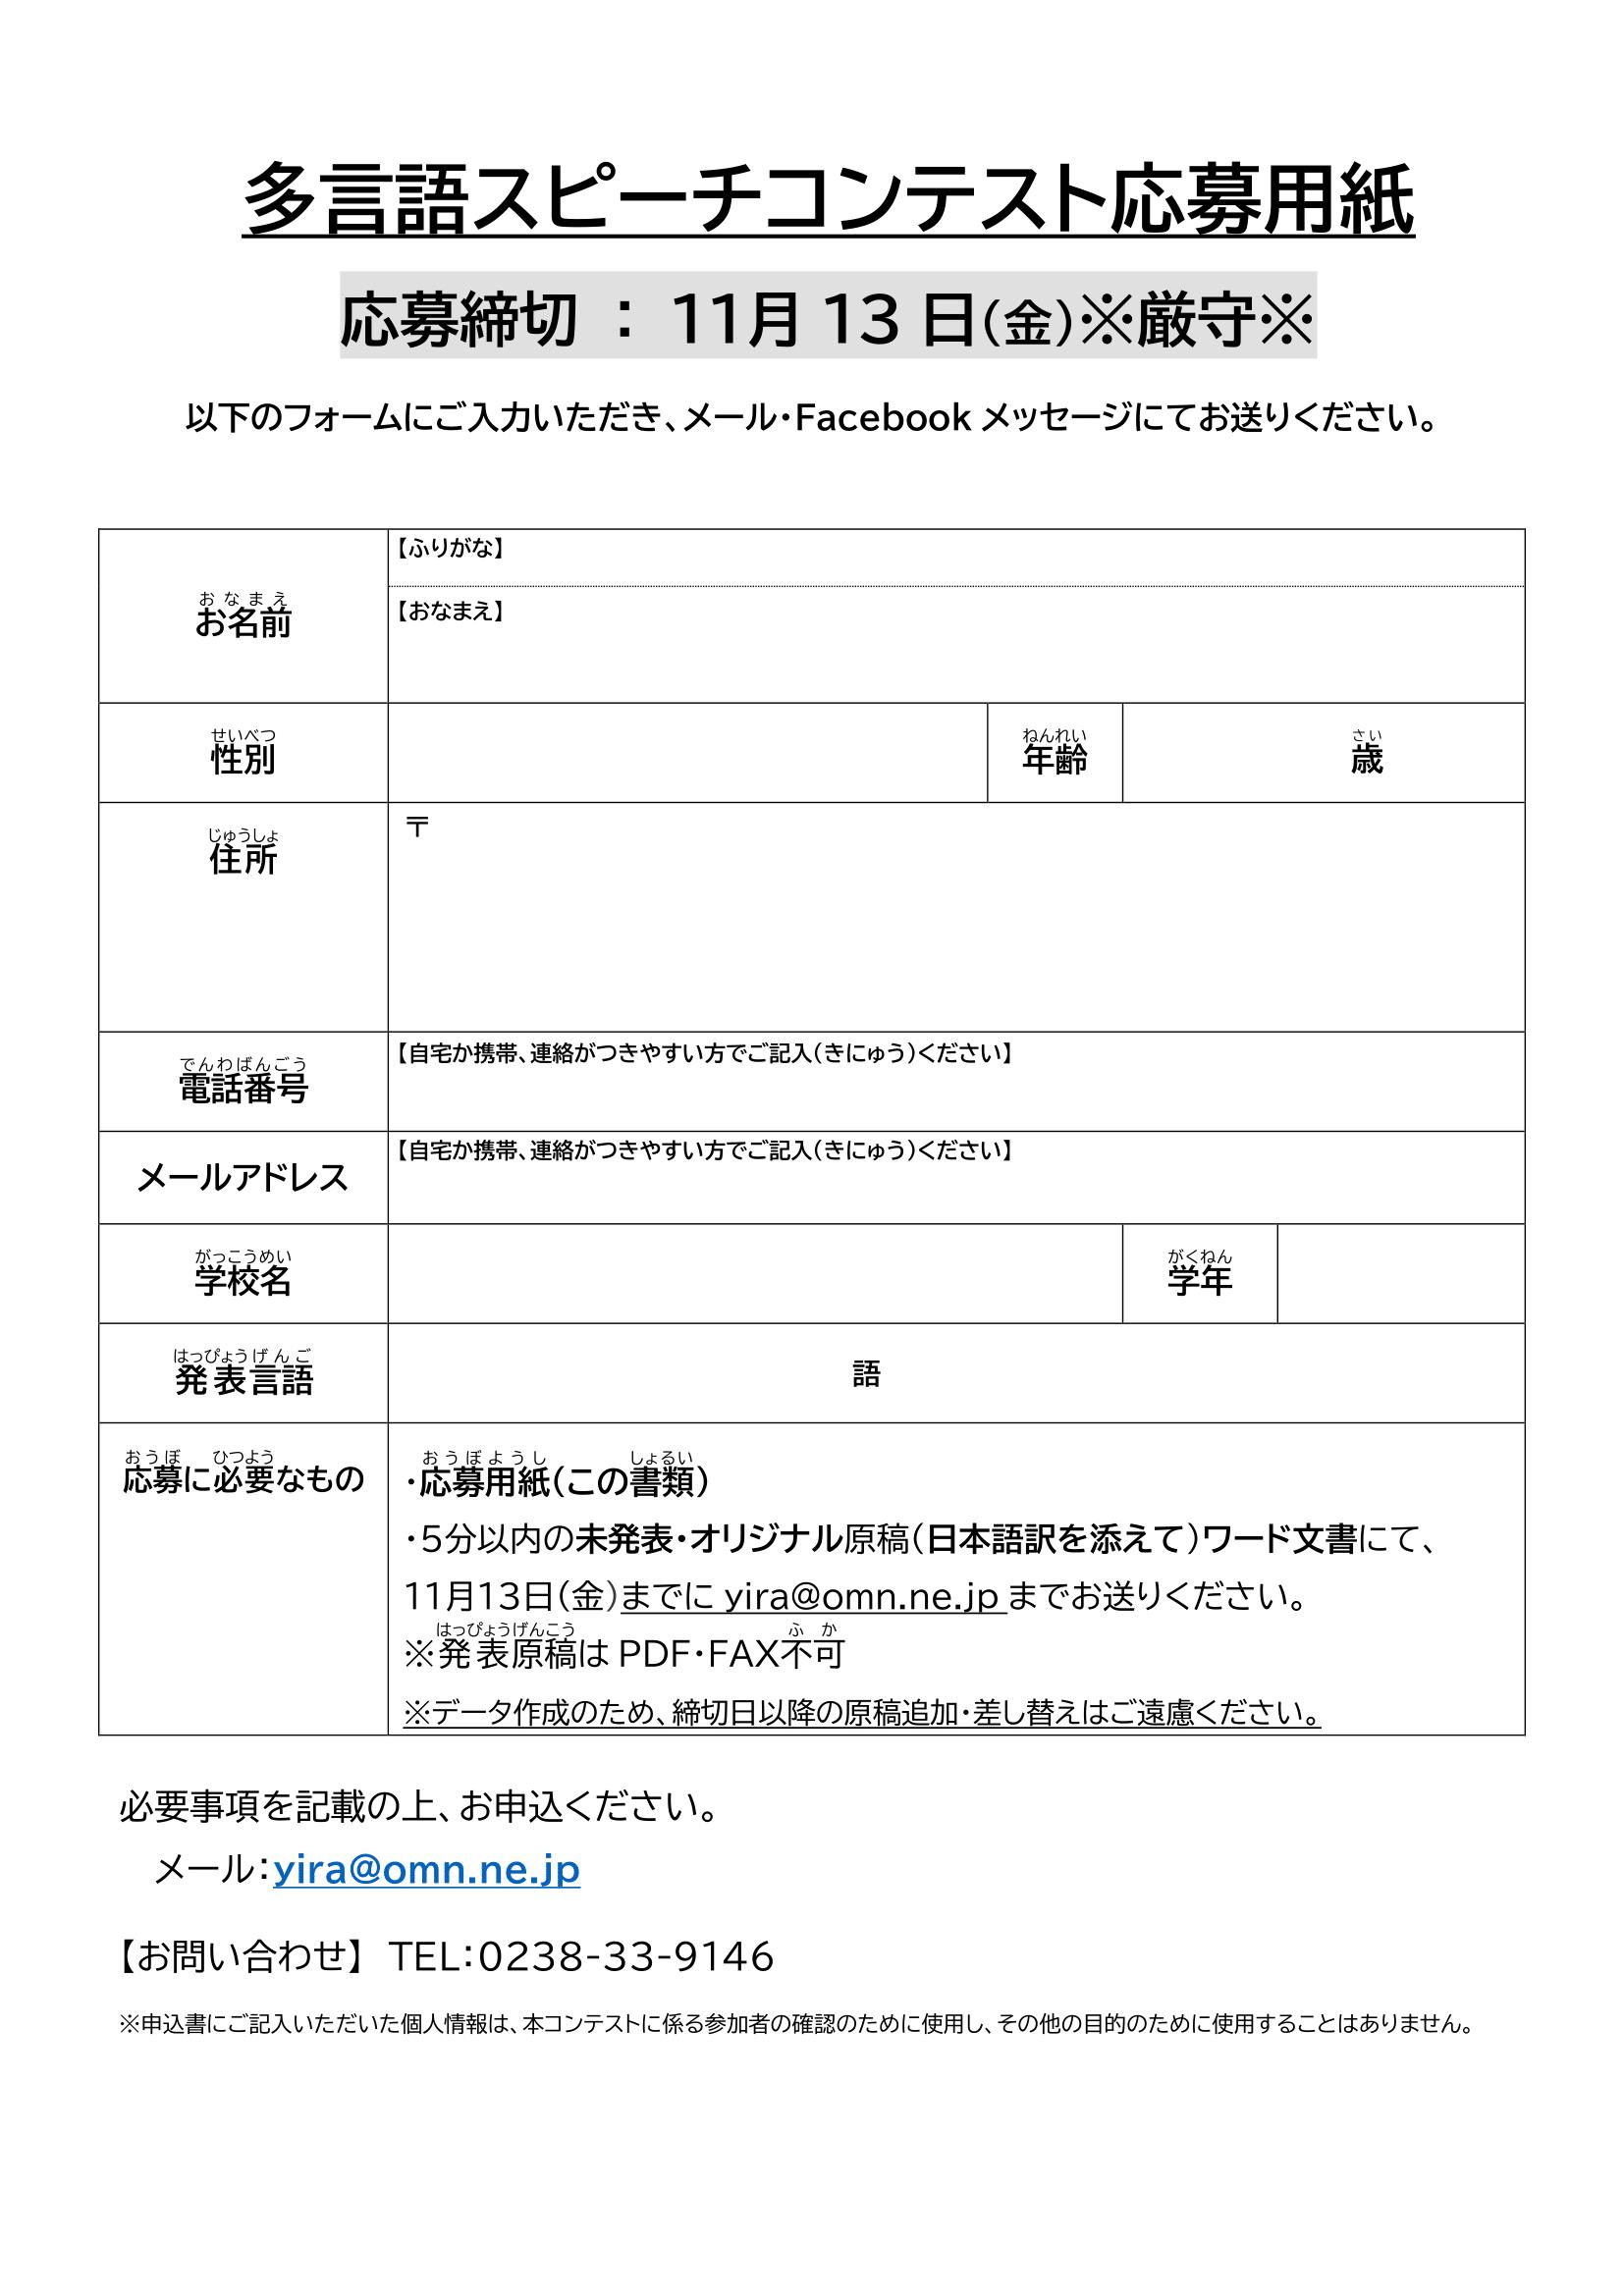 Multi-Language Speech Contest